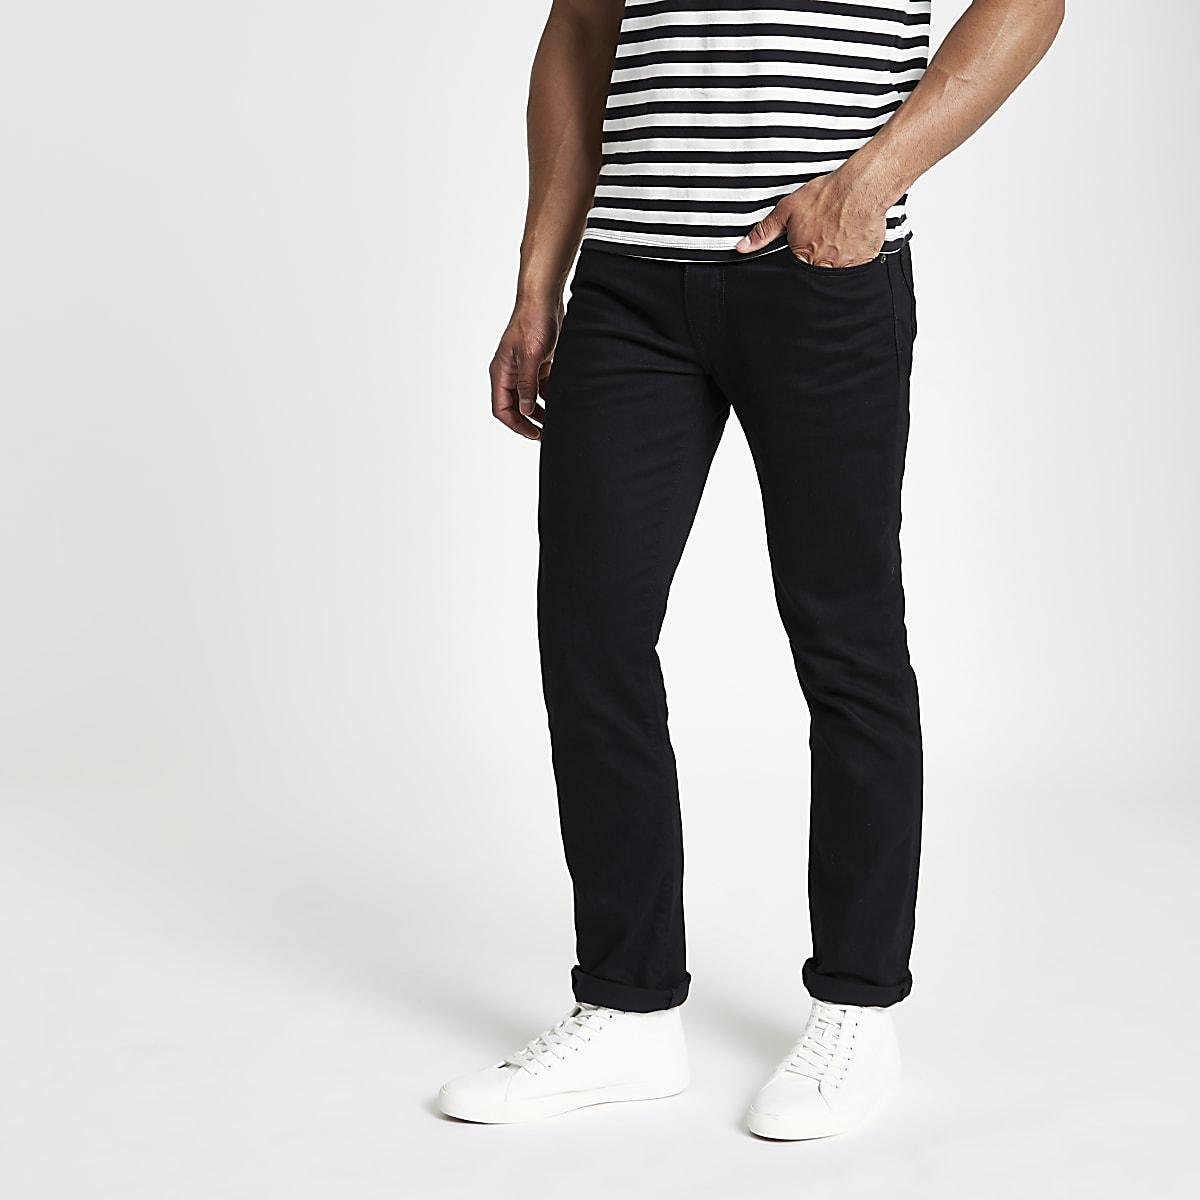 Levi's 511 black slim fit jeans